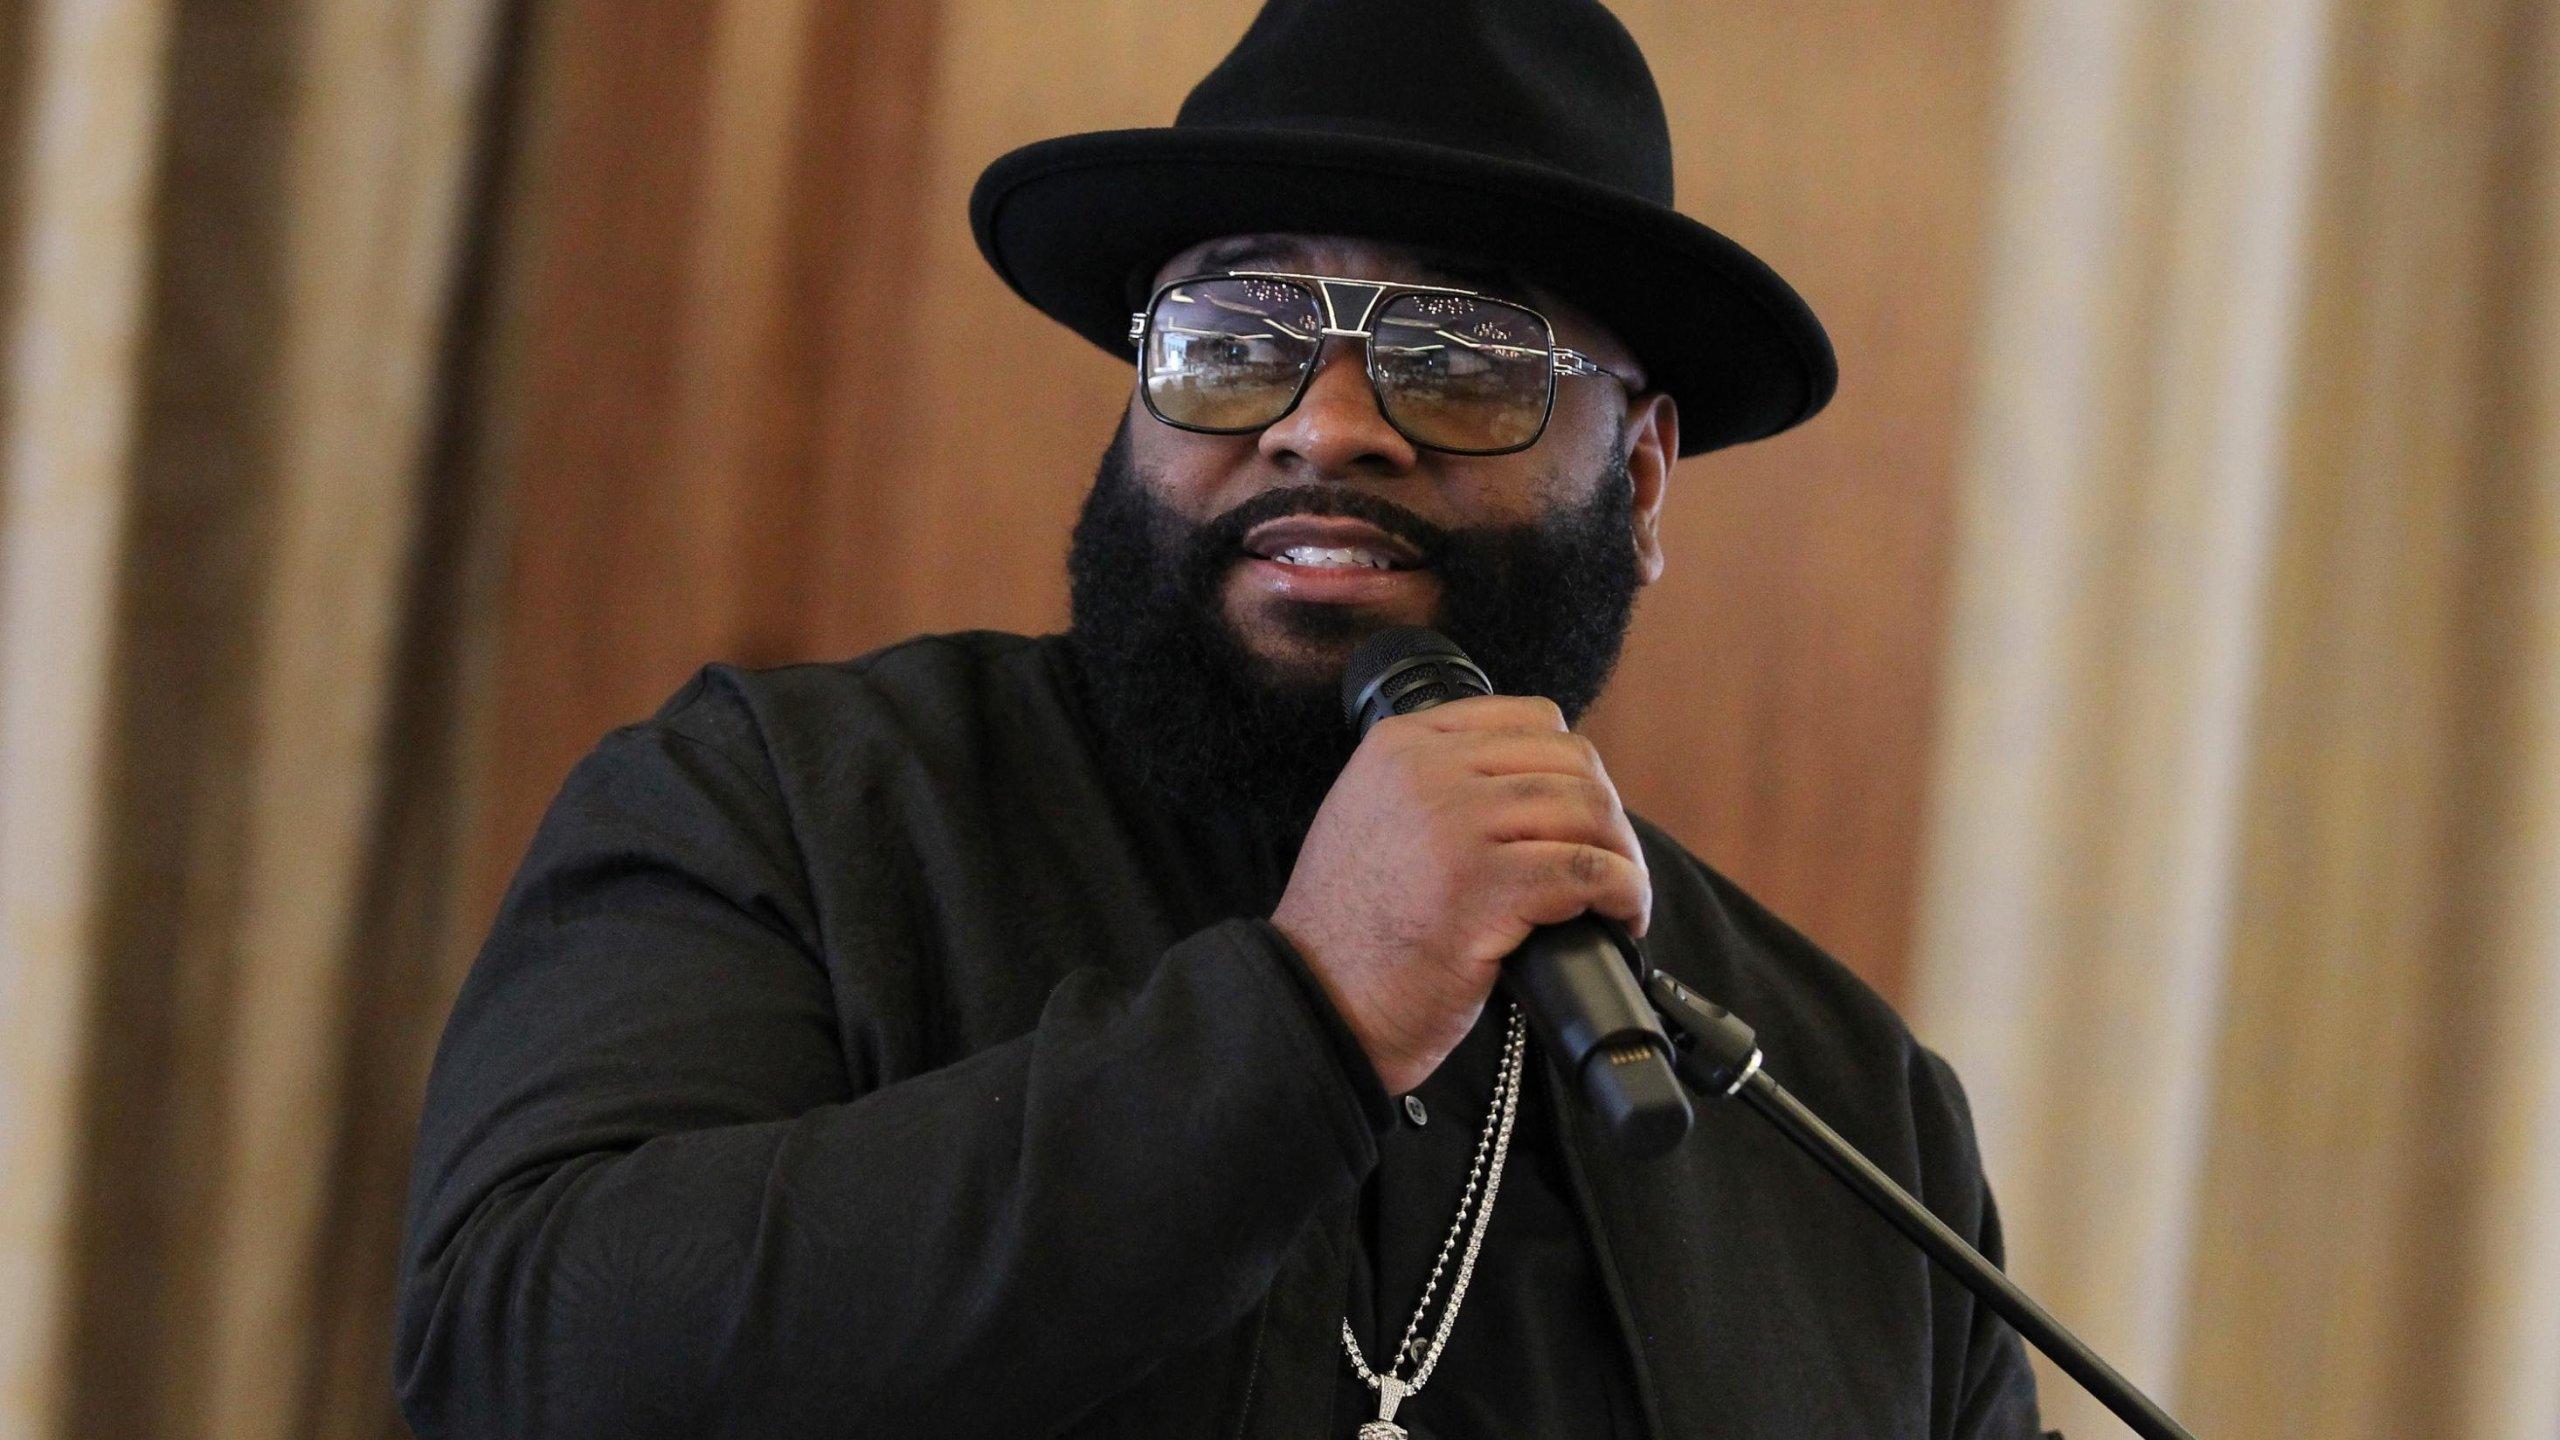 Musician LaShawnDaniels host the ninth annual ASCAP and Motown Gospel's Morning Glory Breakfast Reception in Las Vegas on March 24, 2018. (Credit: Leon Bennett / FilmMagic)